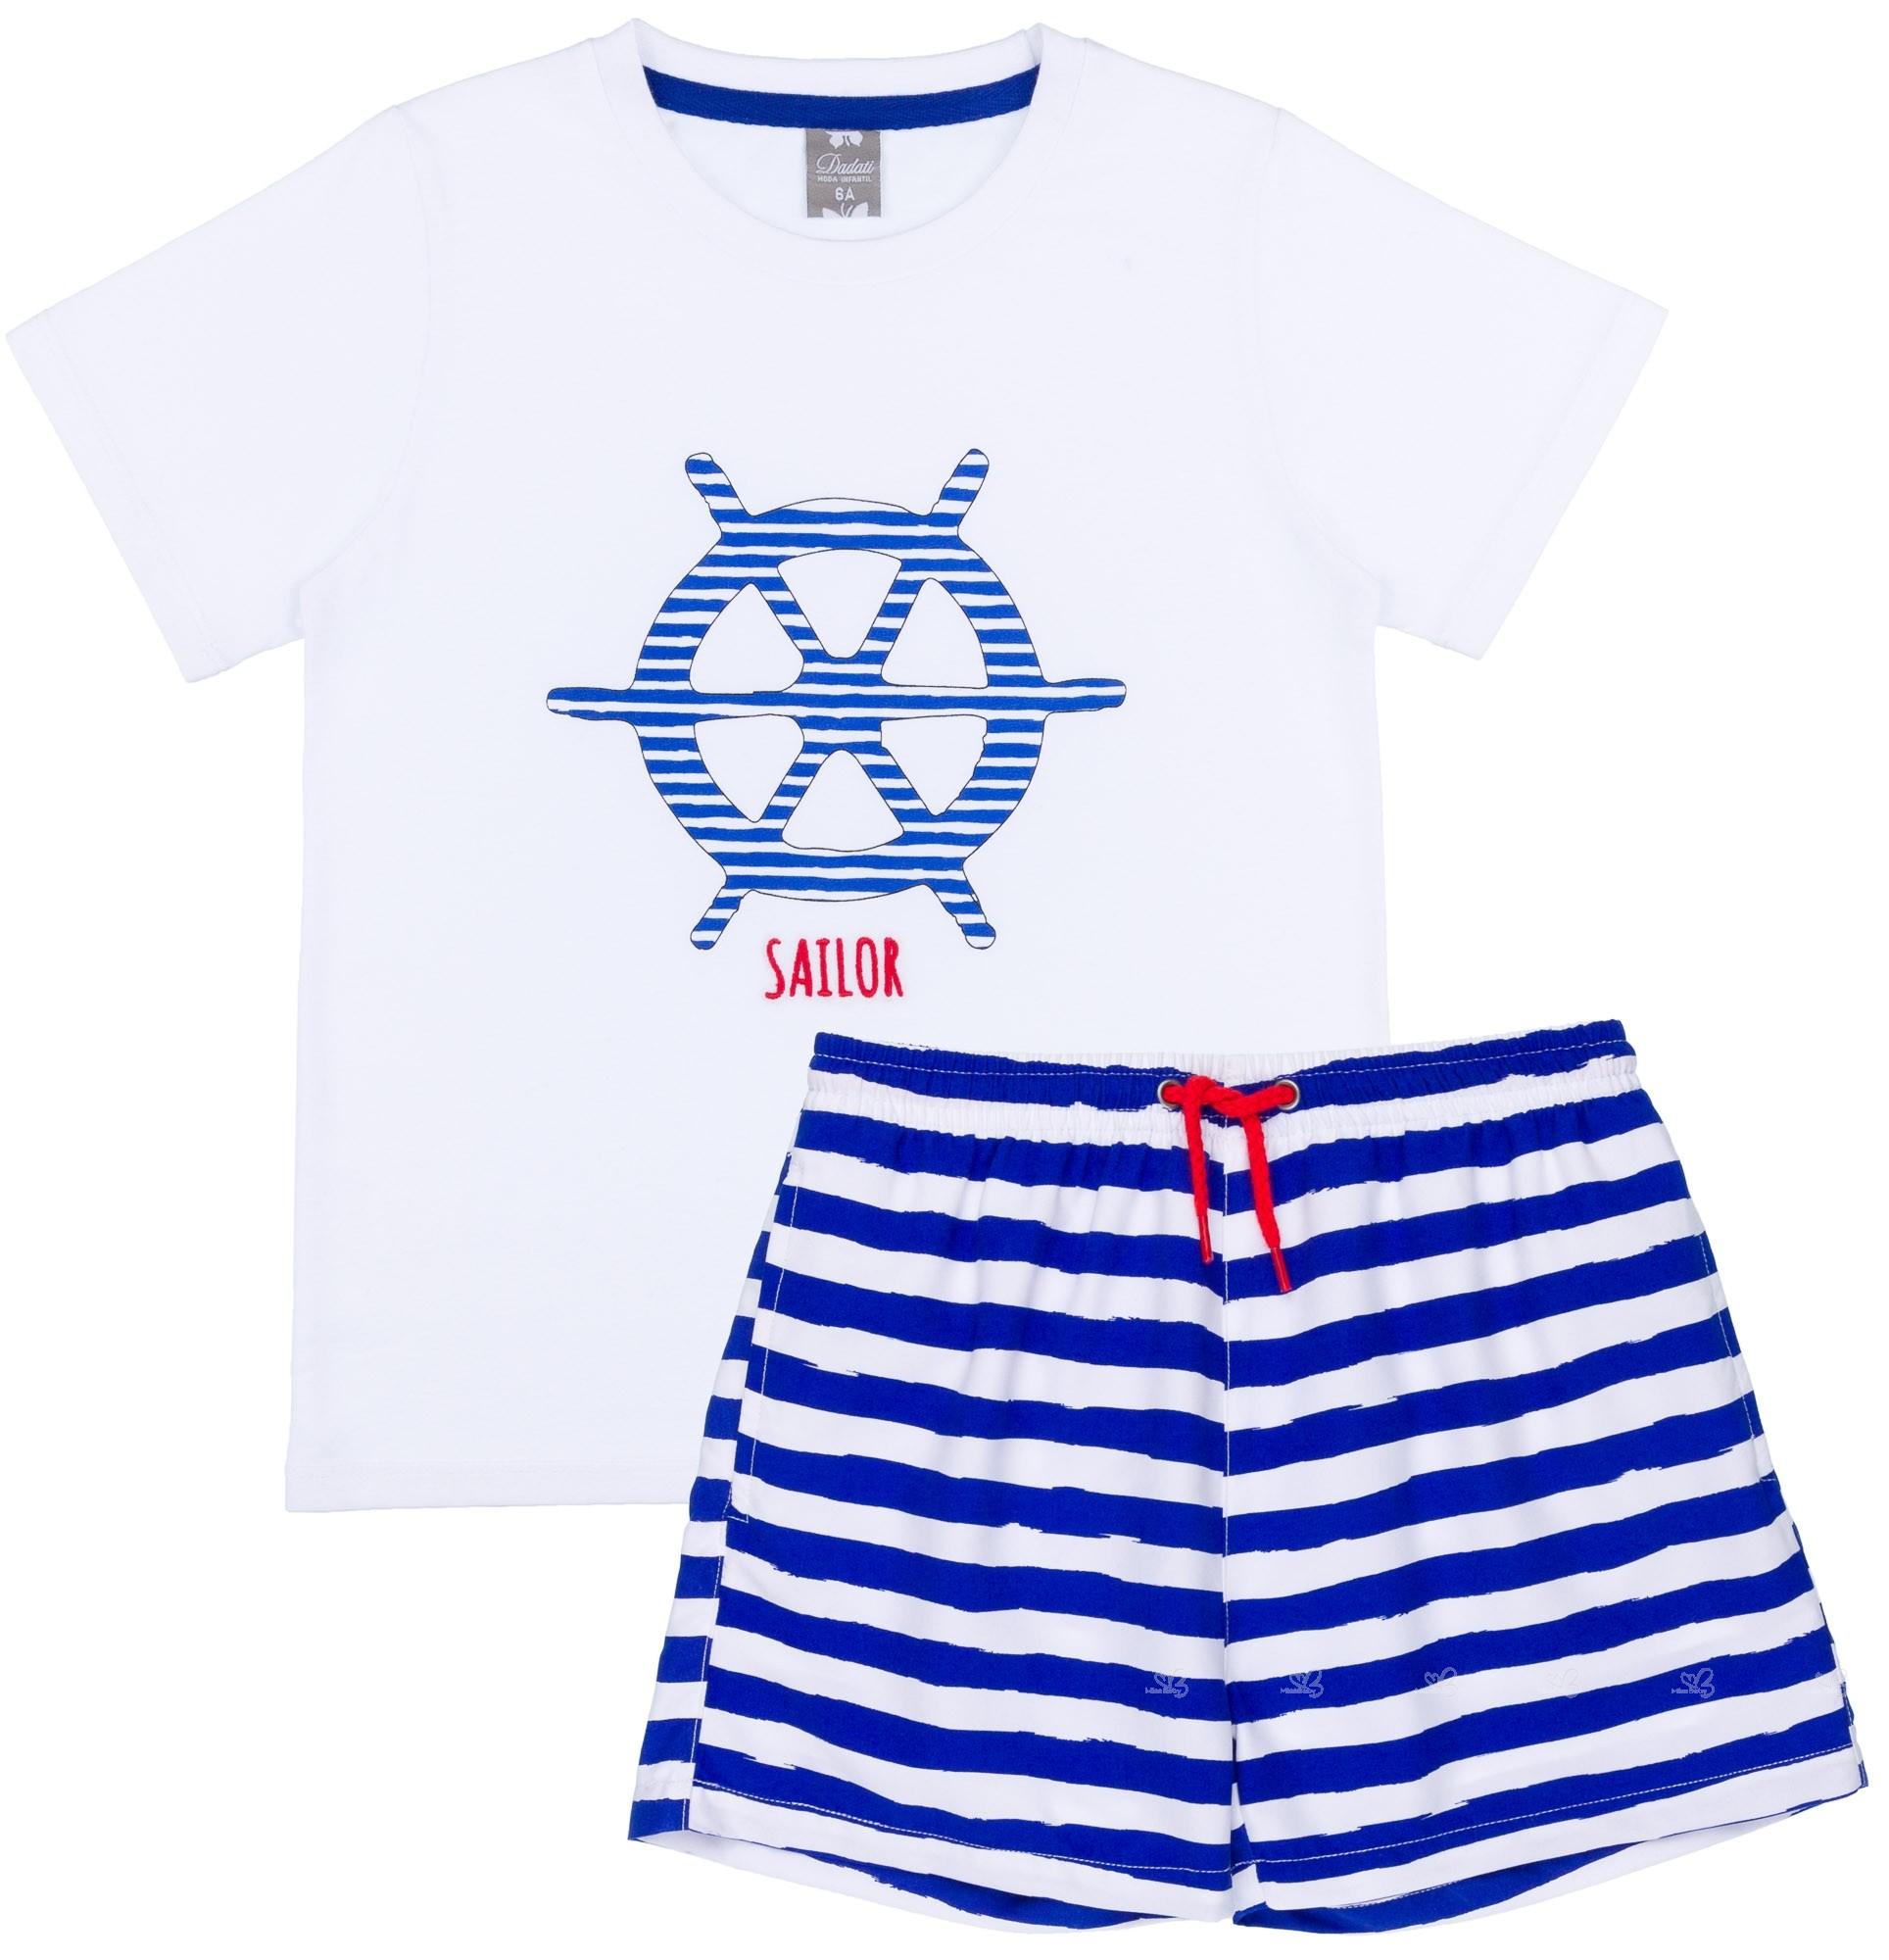 916d5c422016 Conjunto Baño Camiseta Algodón Blanca & Boxer Lycra Rayas Azul